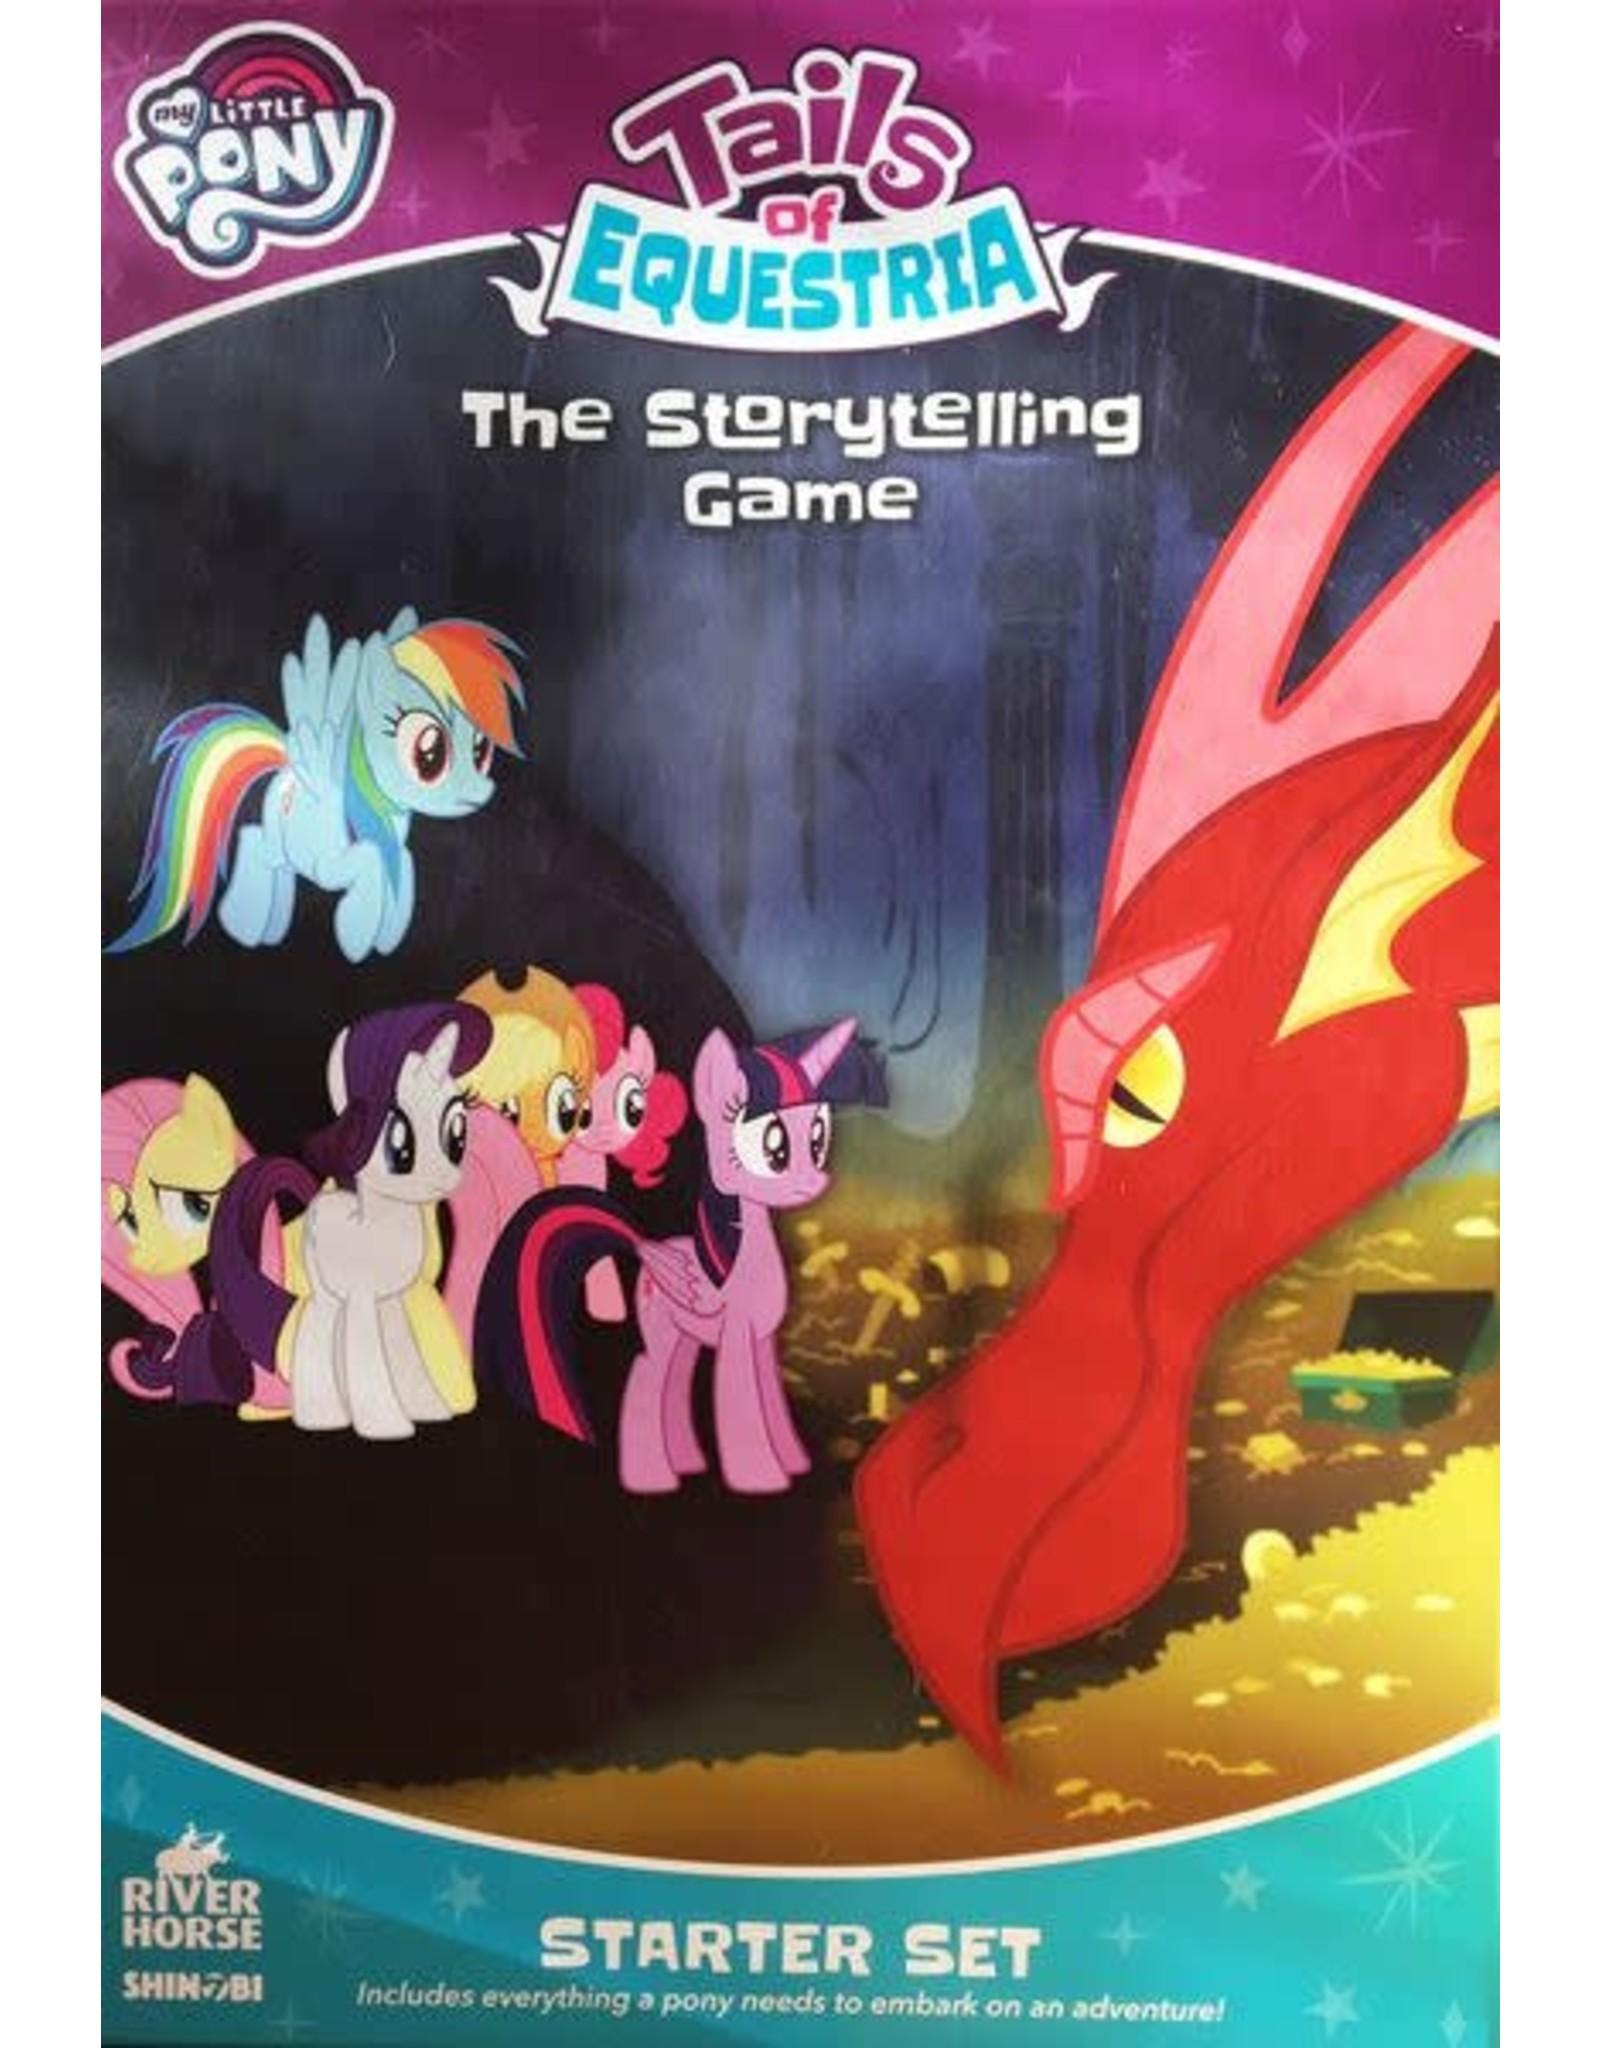 Shinobi 7 My Little Pony: Tails of Equestria RPG - Starter Set